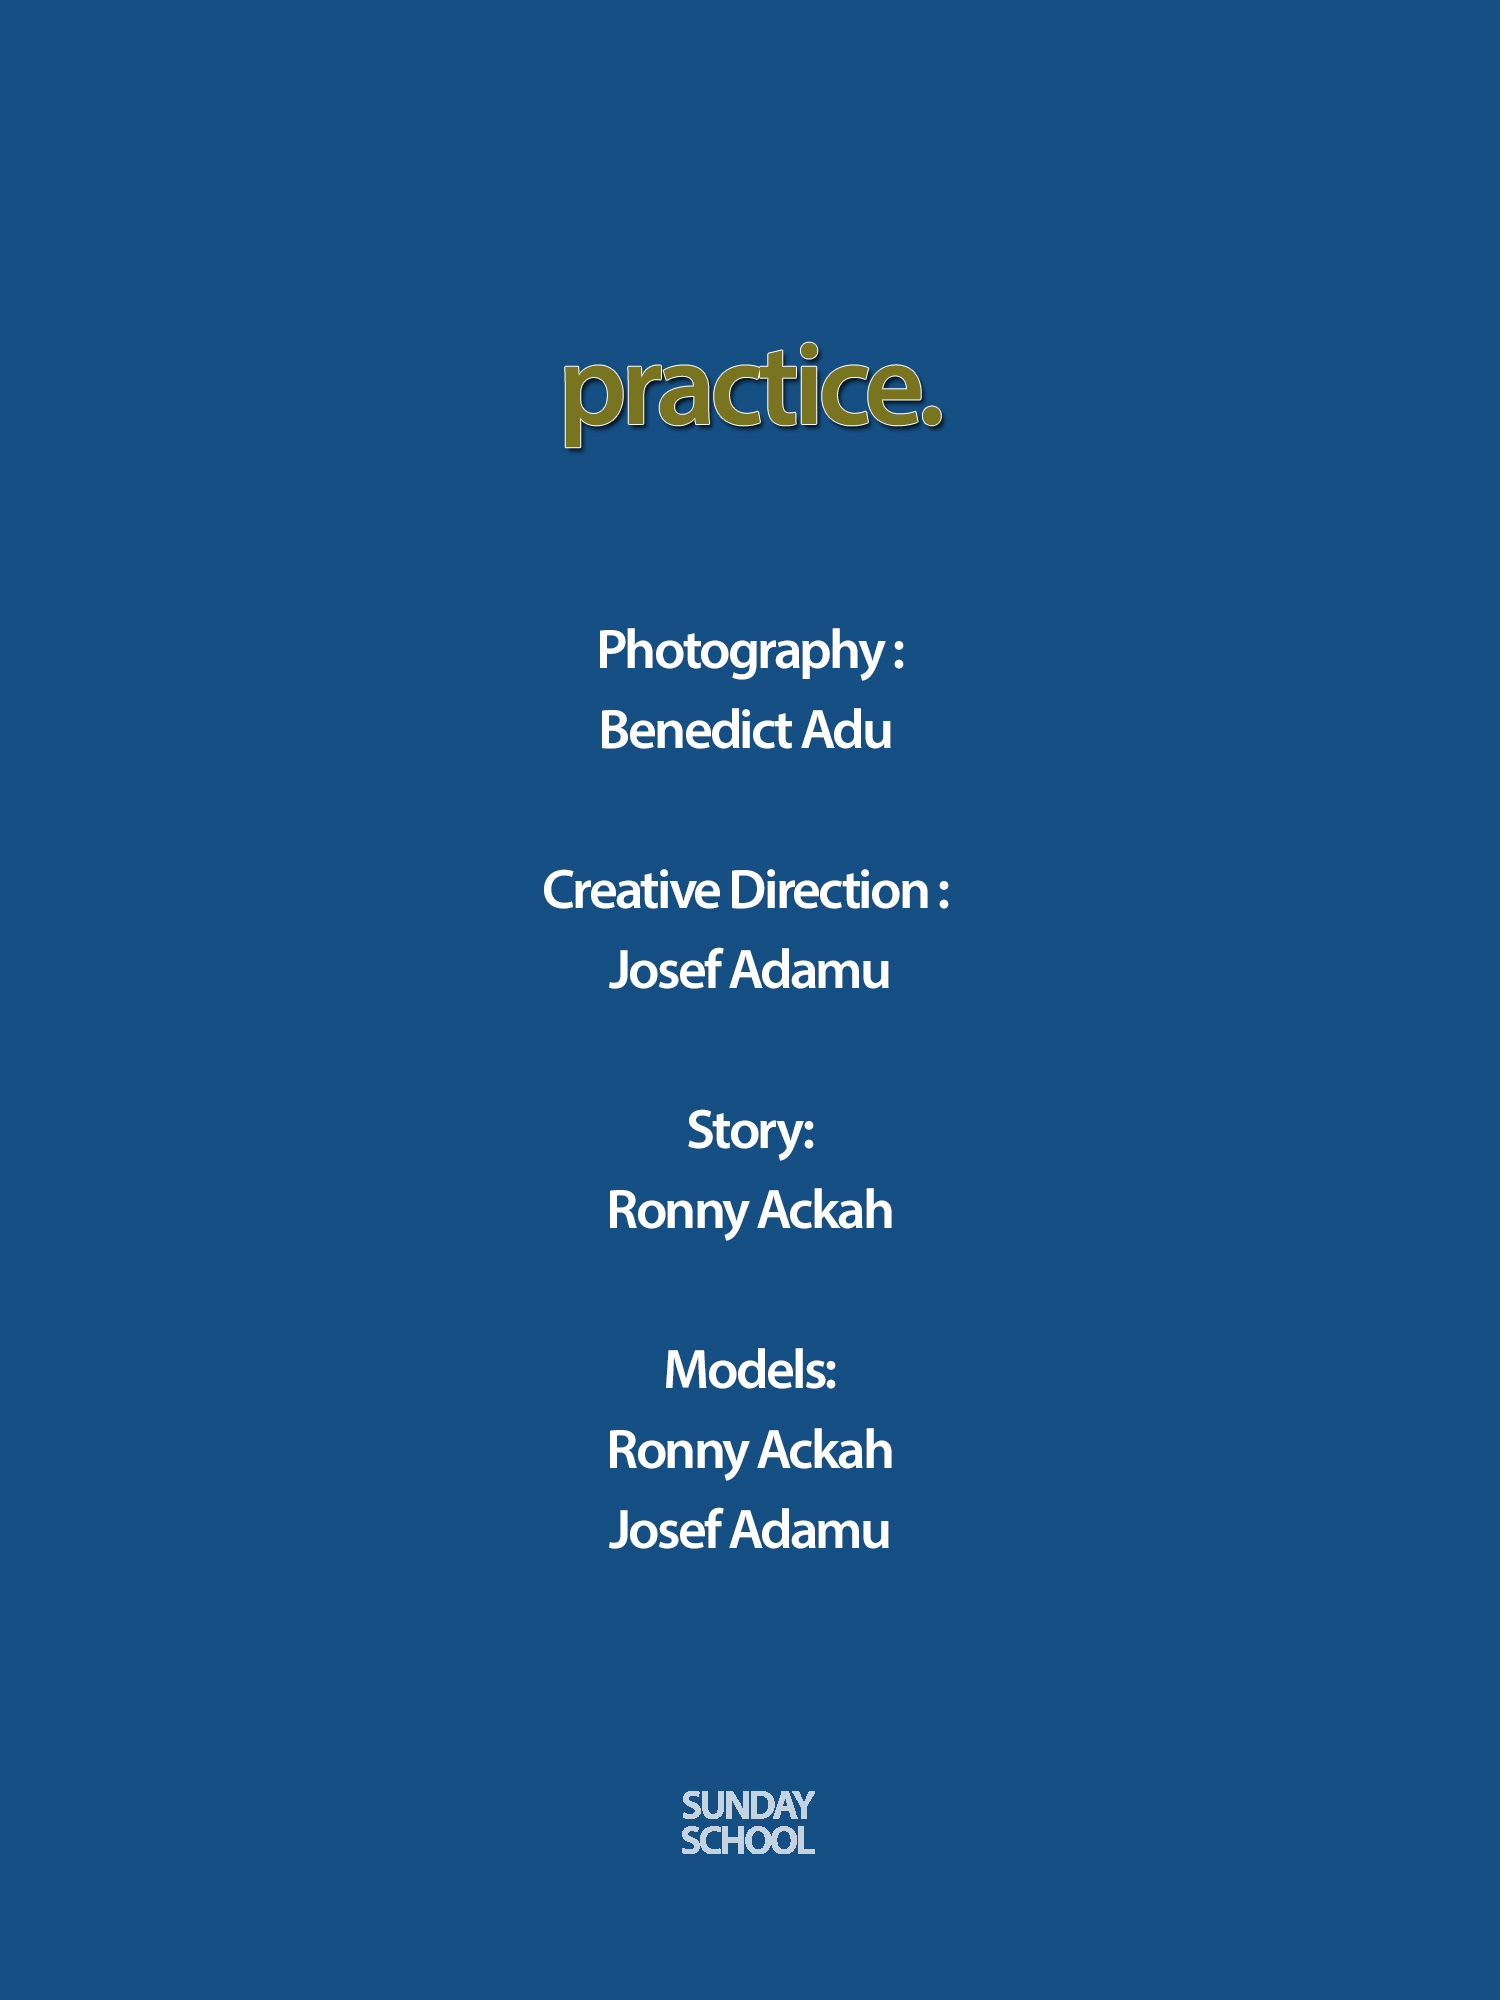 practiceofficial1.jpg